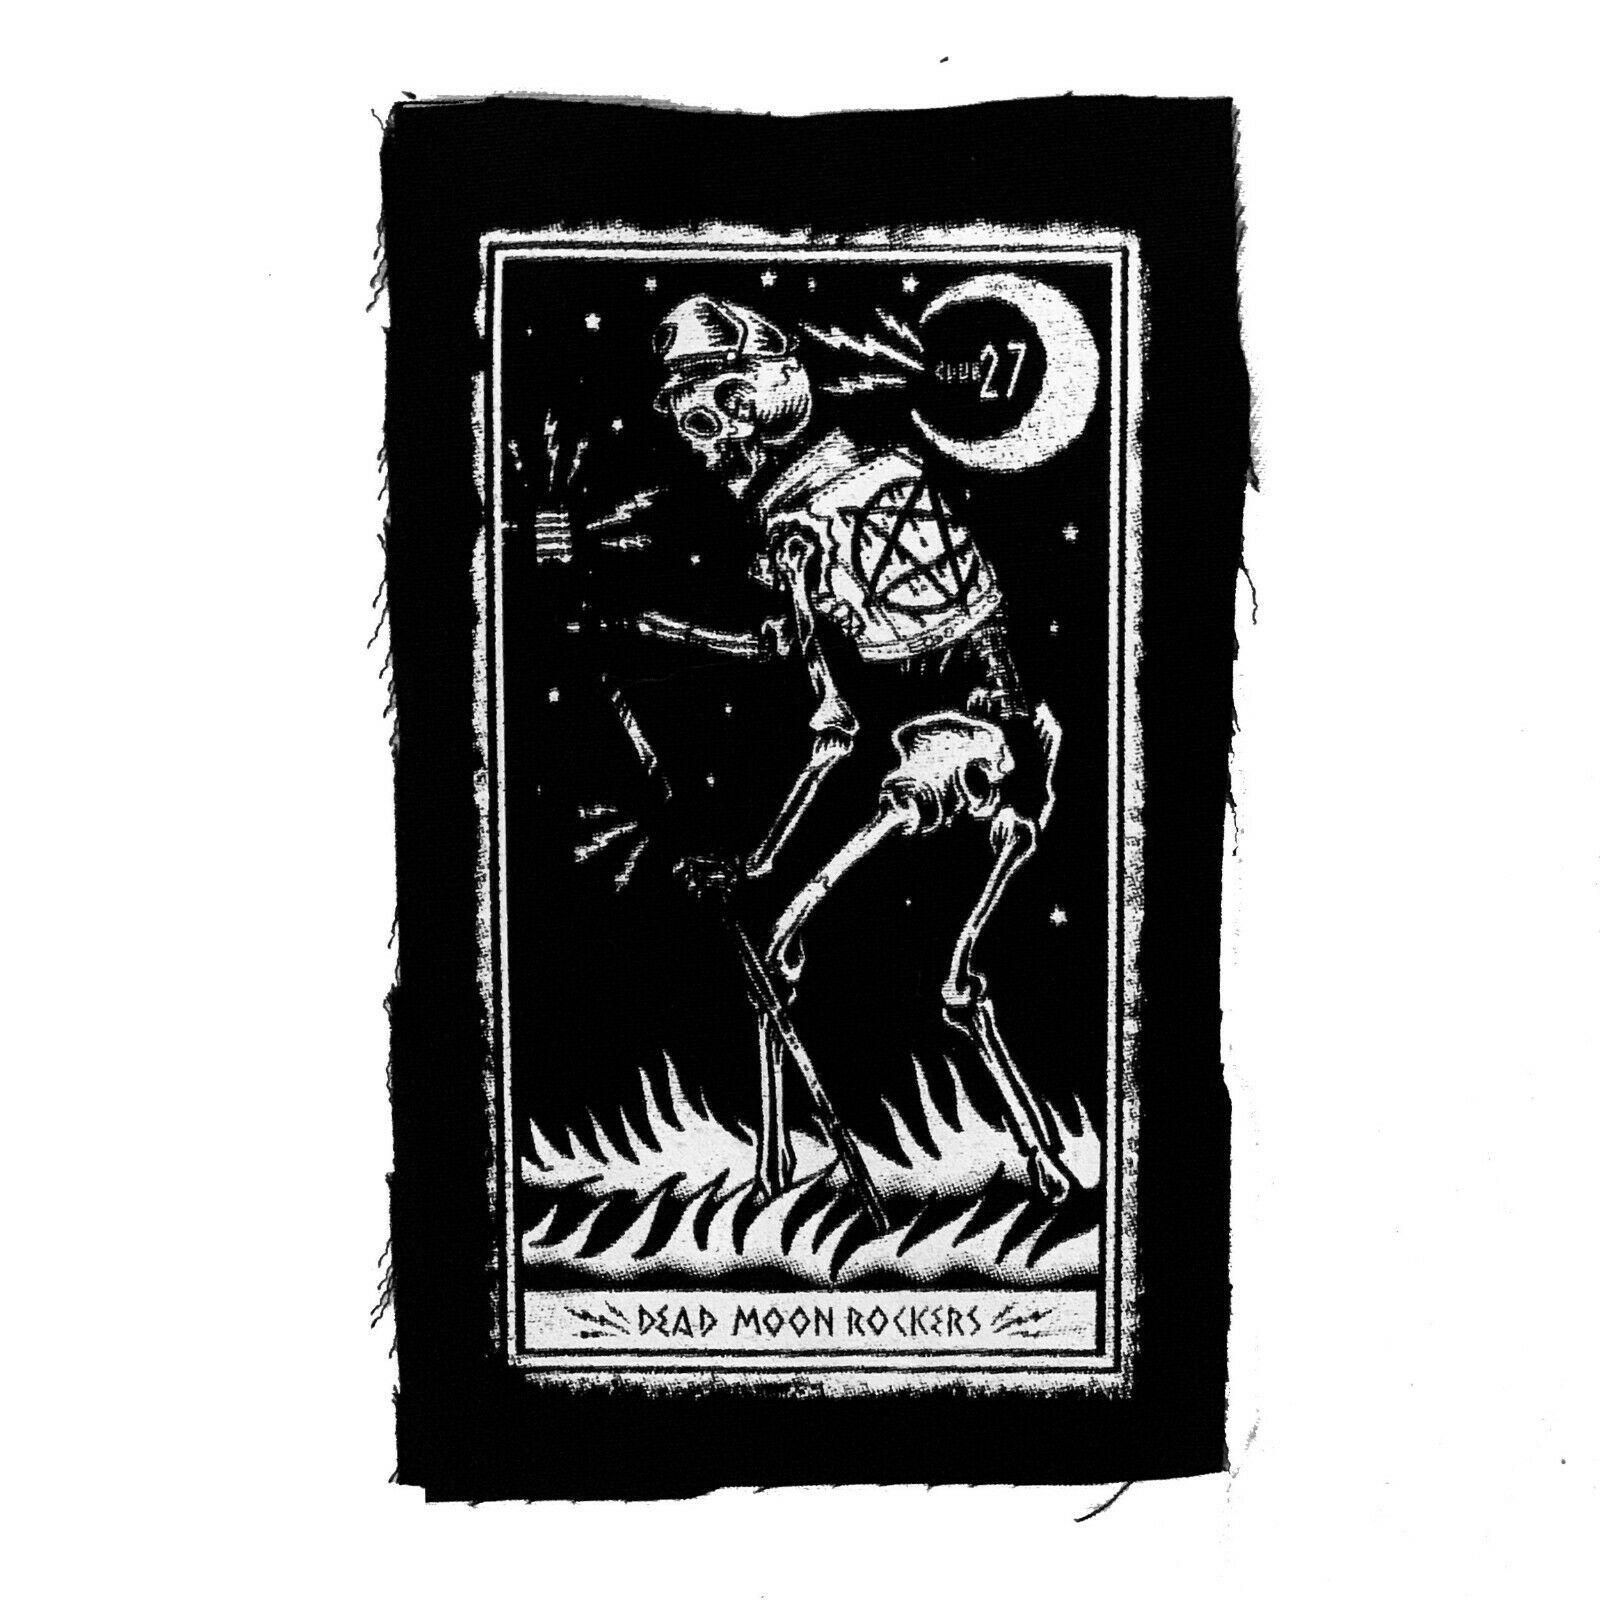 Too Fast Club 27 Dead Moon Rockers Gotico Punk Pentagramma Panno Patch image 3